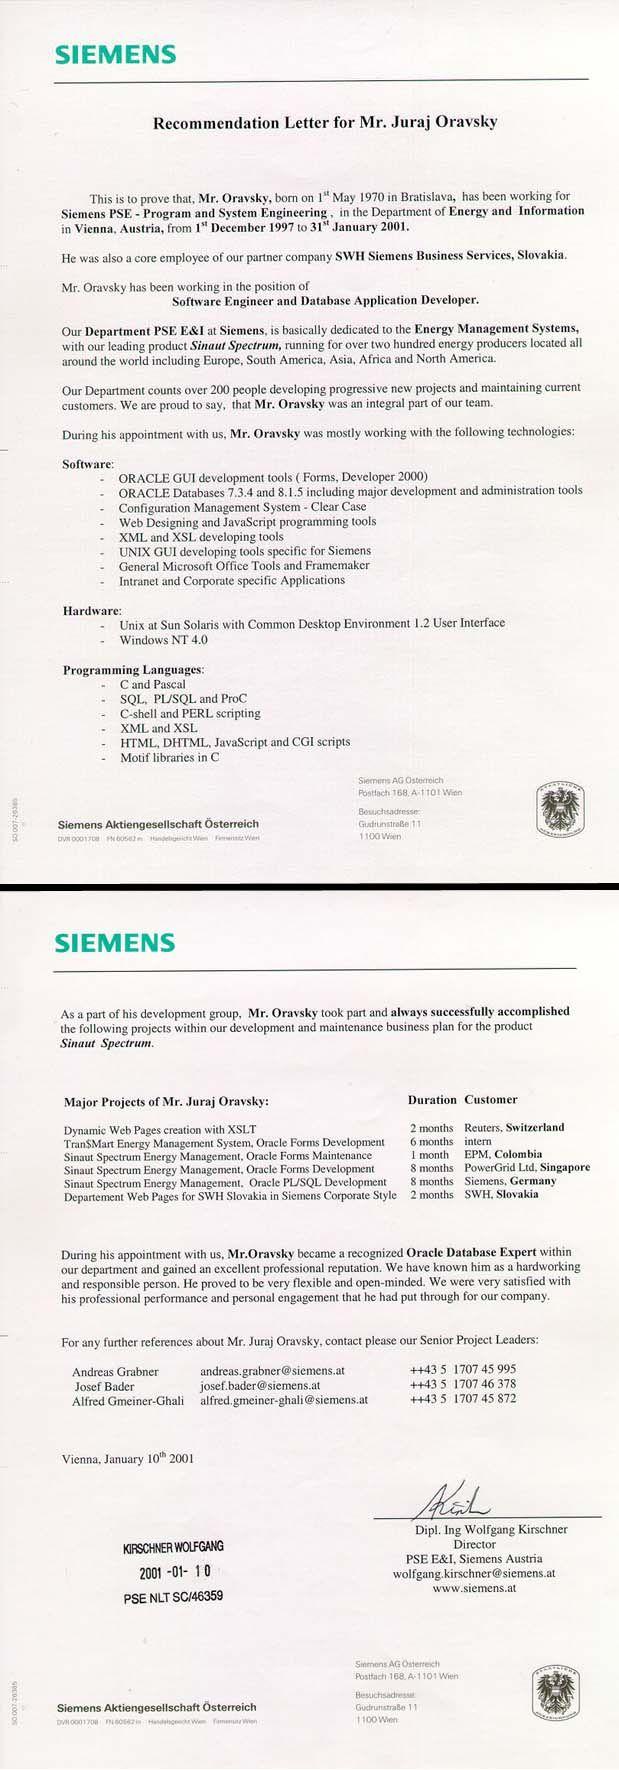 Webload Performance Tester Cover Letter Free Business Lease Date Siemens  Letterhtml | Home Design Idea | Pinterest | Interiors